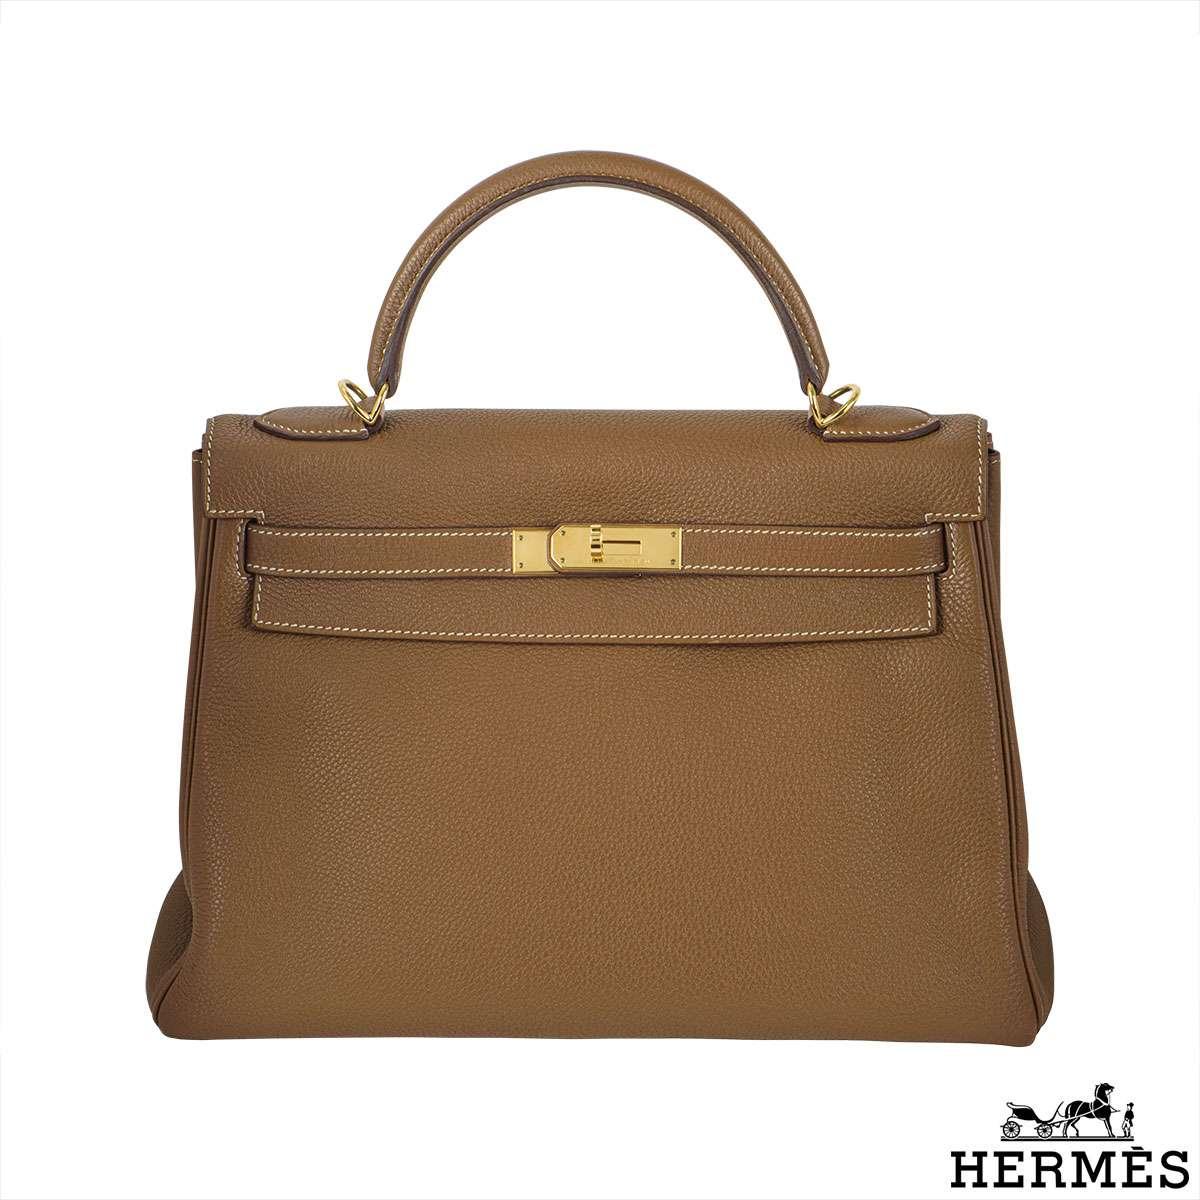 Hermes Kelly 32 cm Togo leather GHW handbag